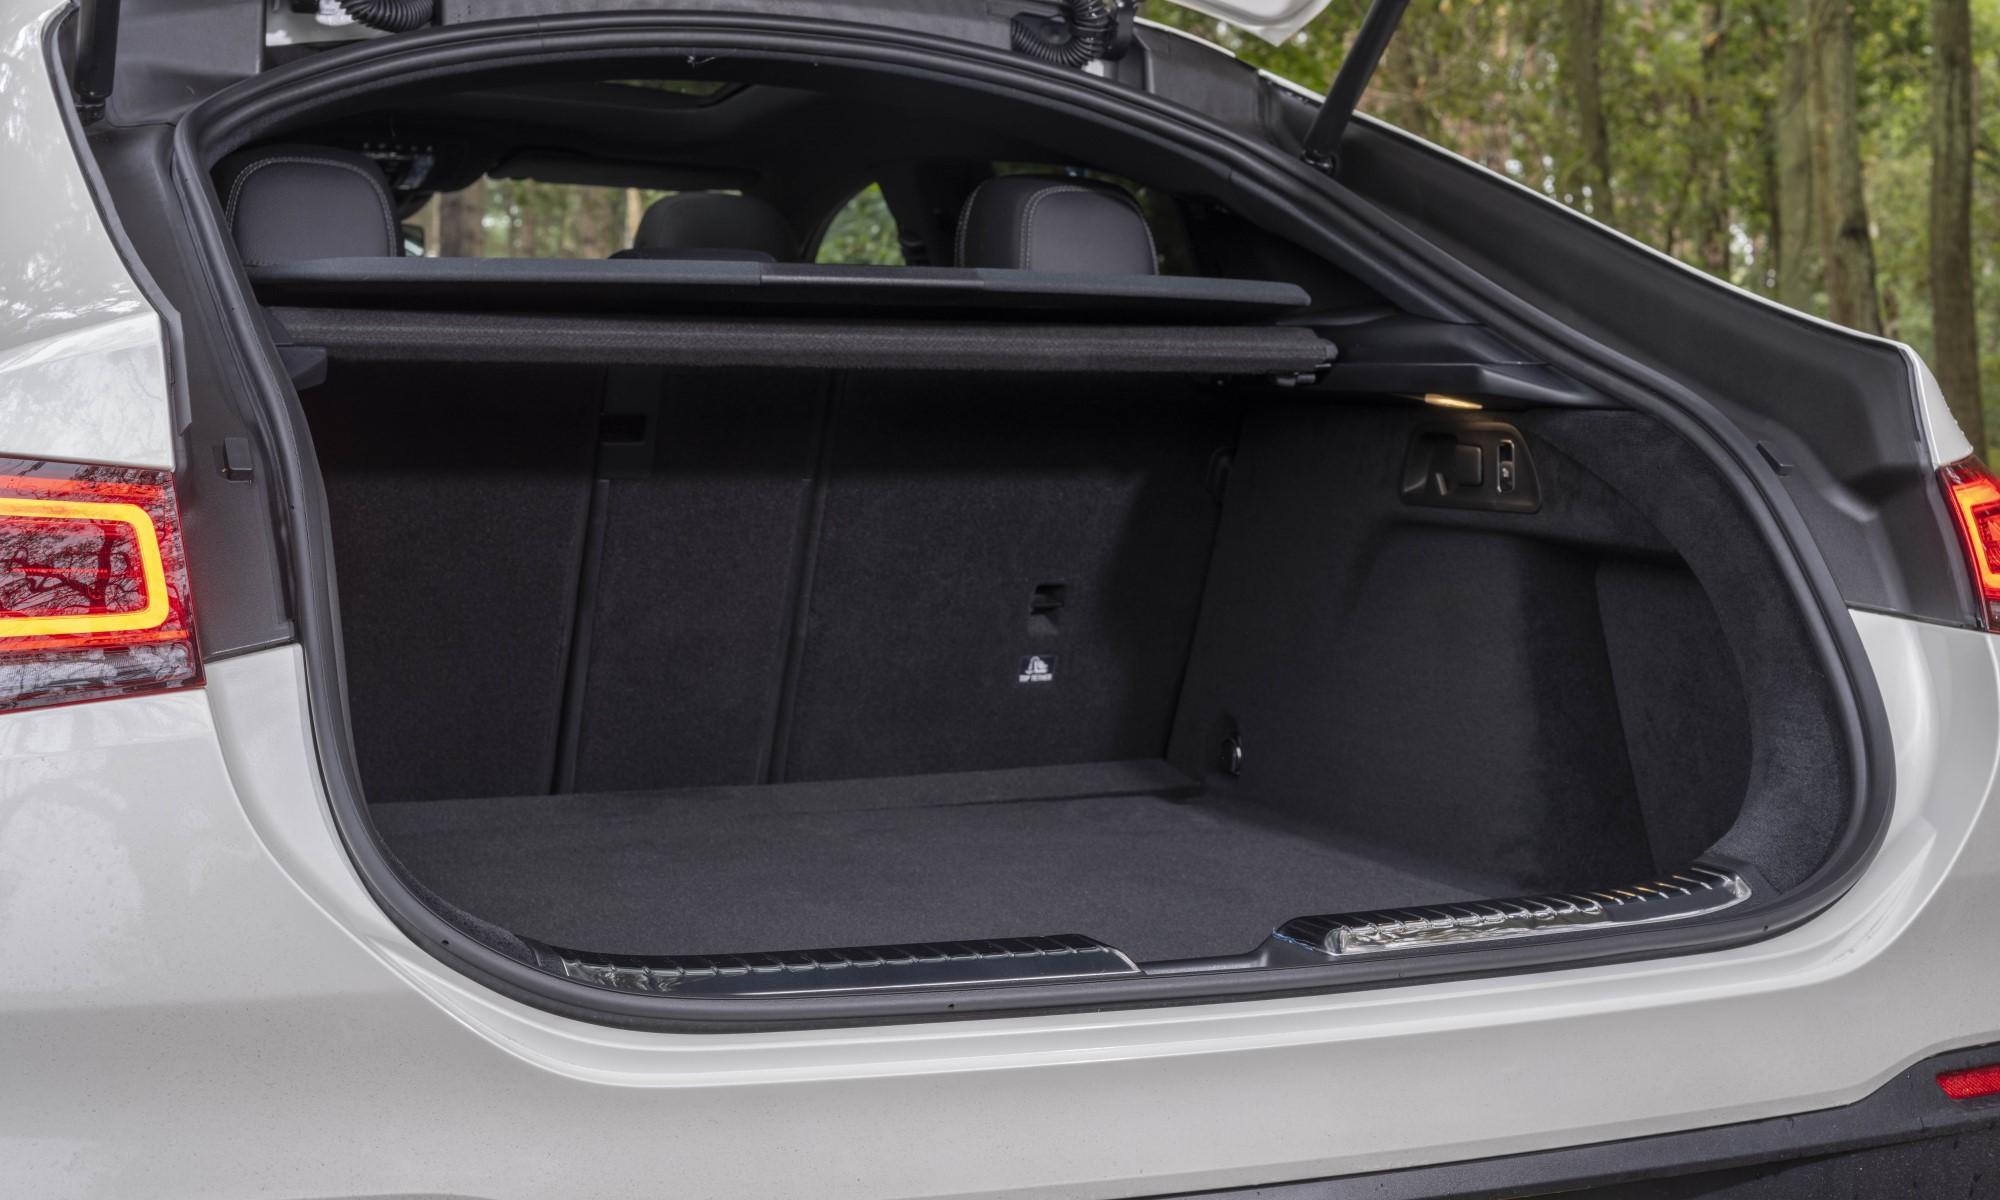 Mercedes-Benz GLE400d Coupé boot